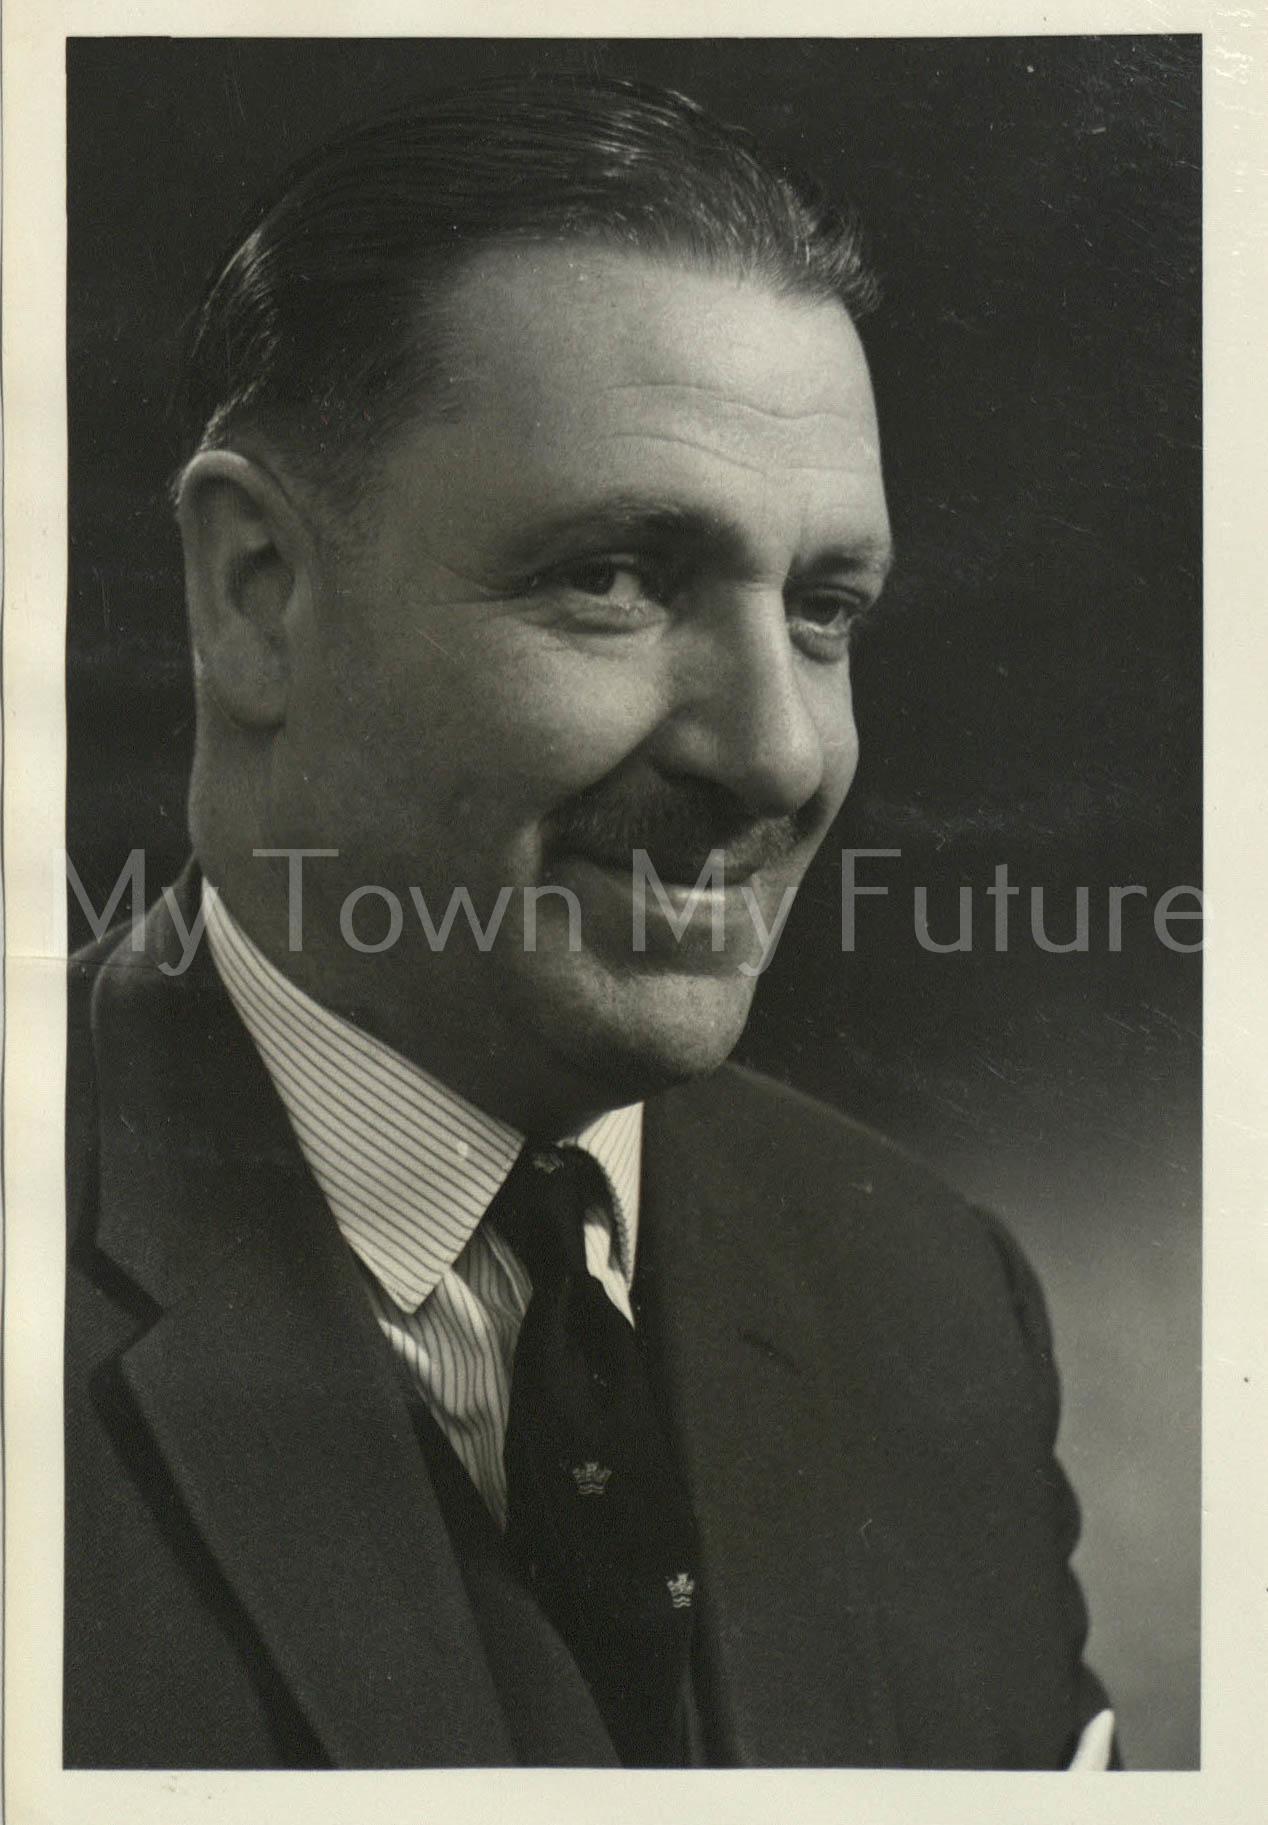 Dr S .Jenkin Evans Industrial Eisteddford